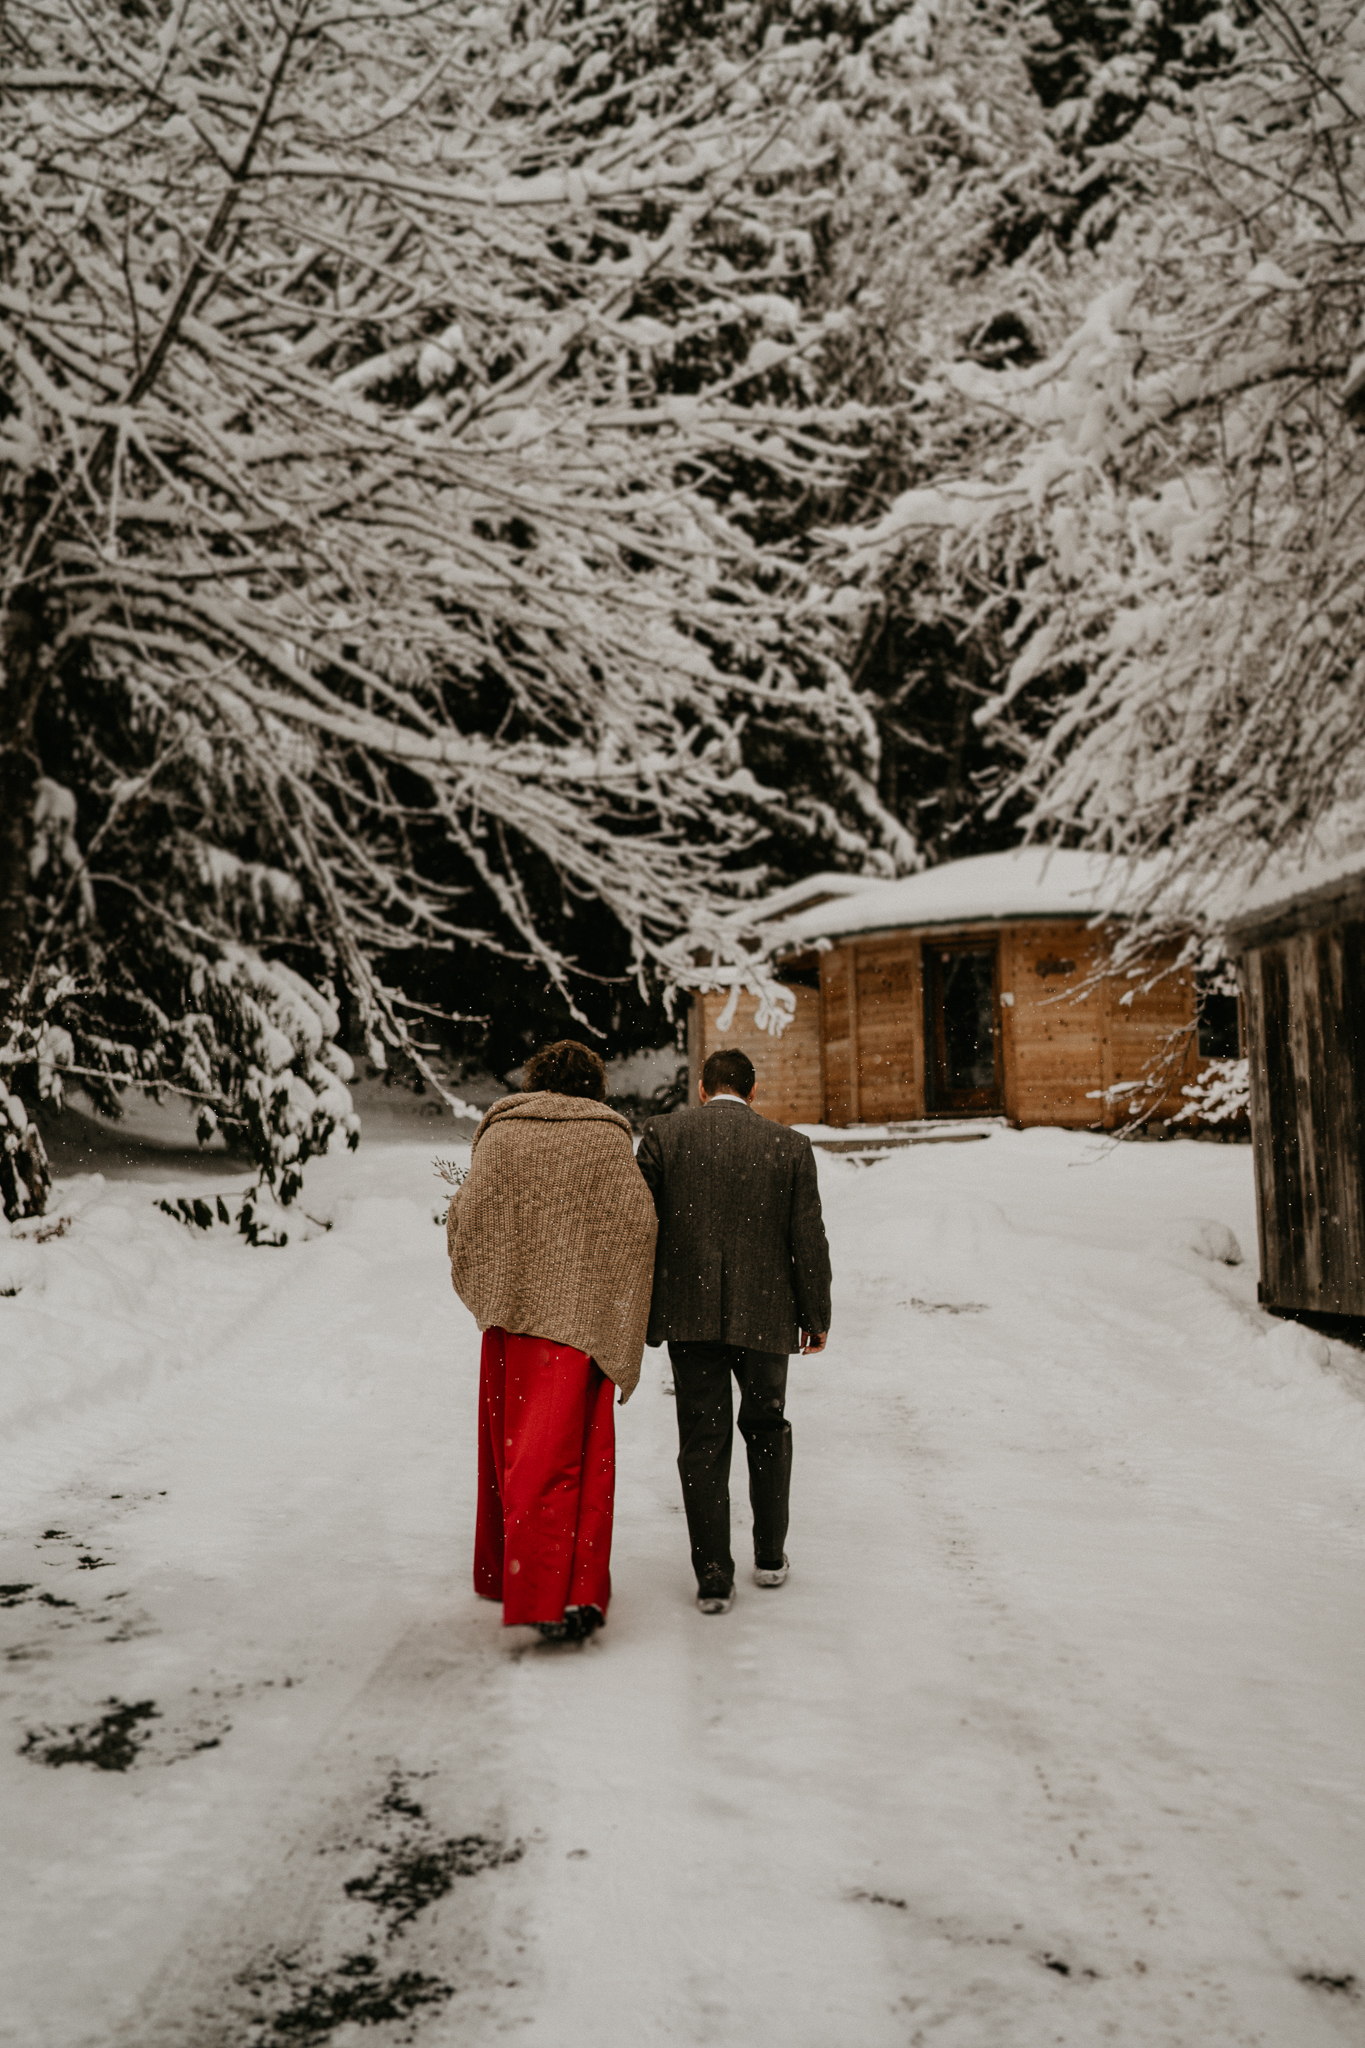 Storm King Cabin Wolf mount rainier paradise romantic snow